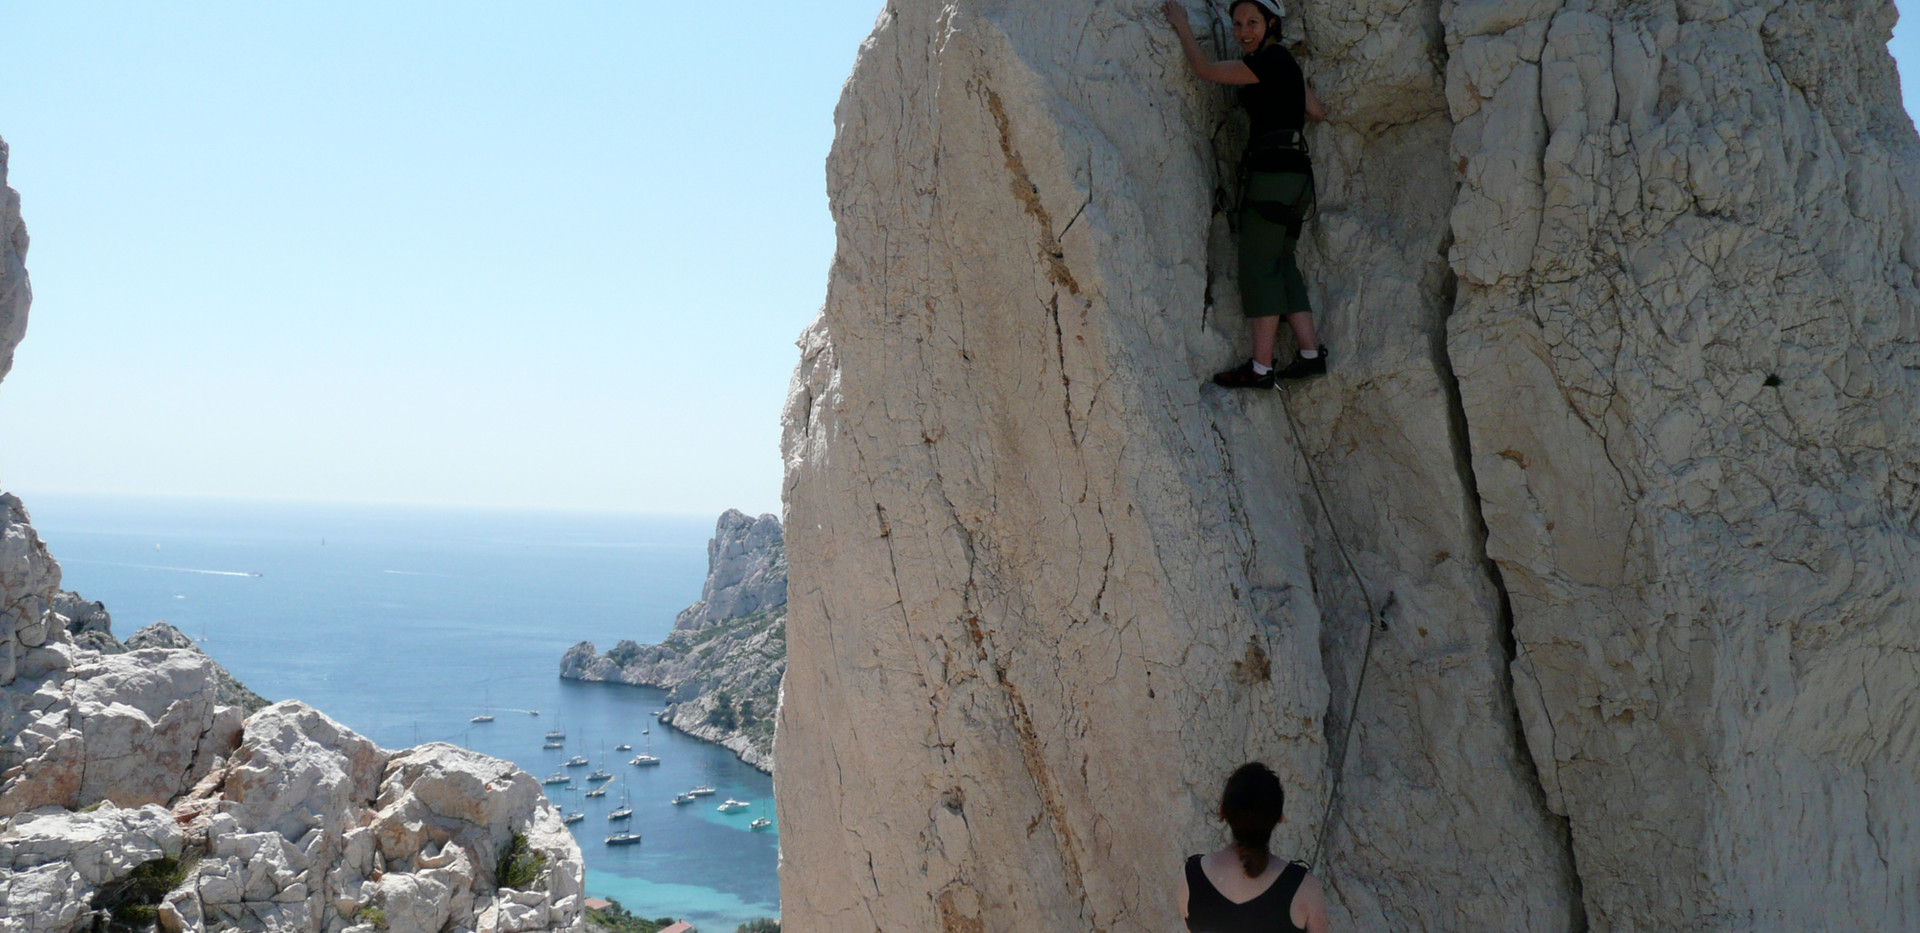 Montagne-escape, Escalade Via ferrata et cordata